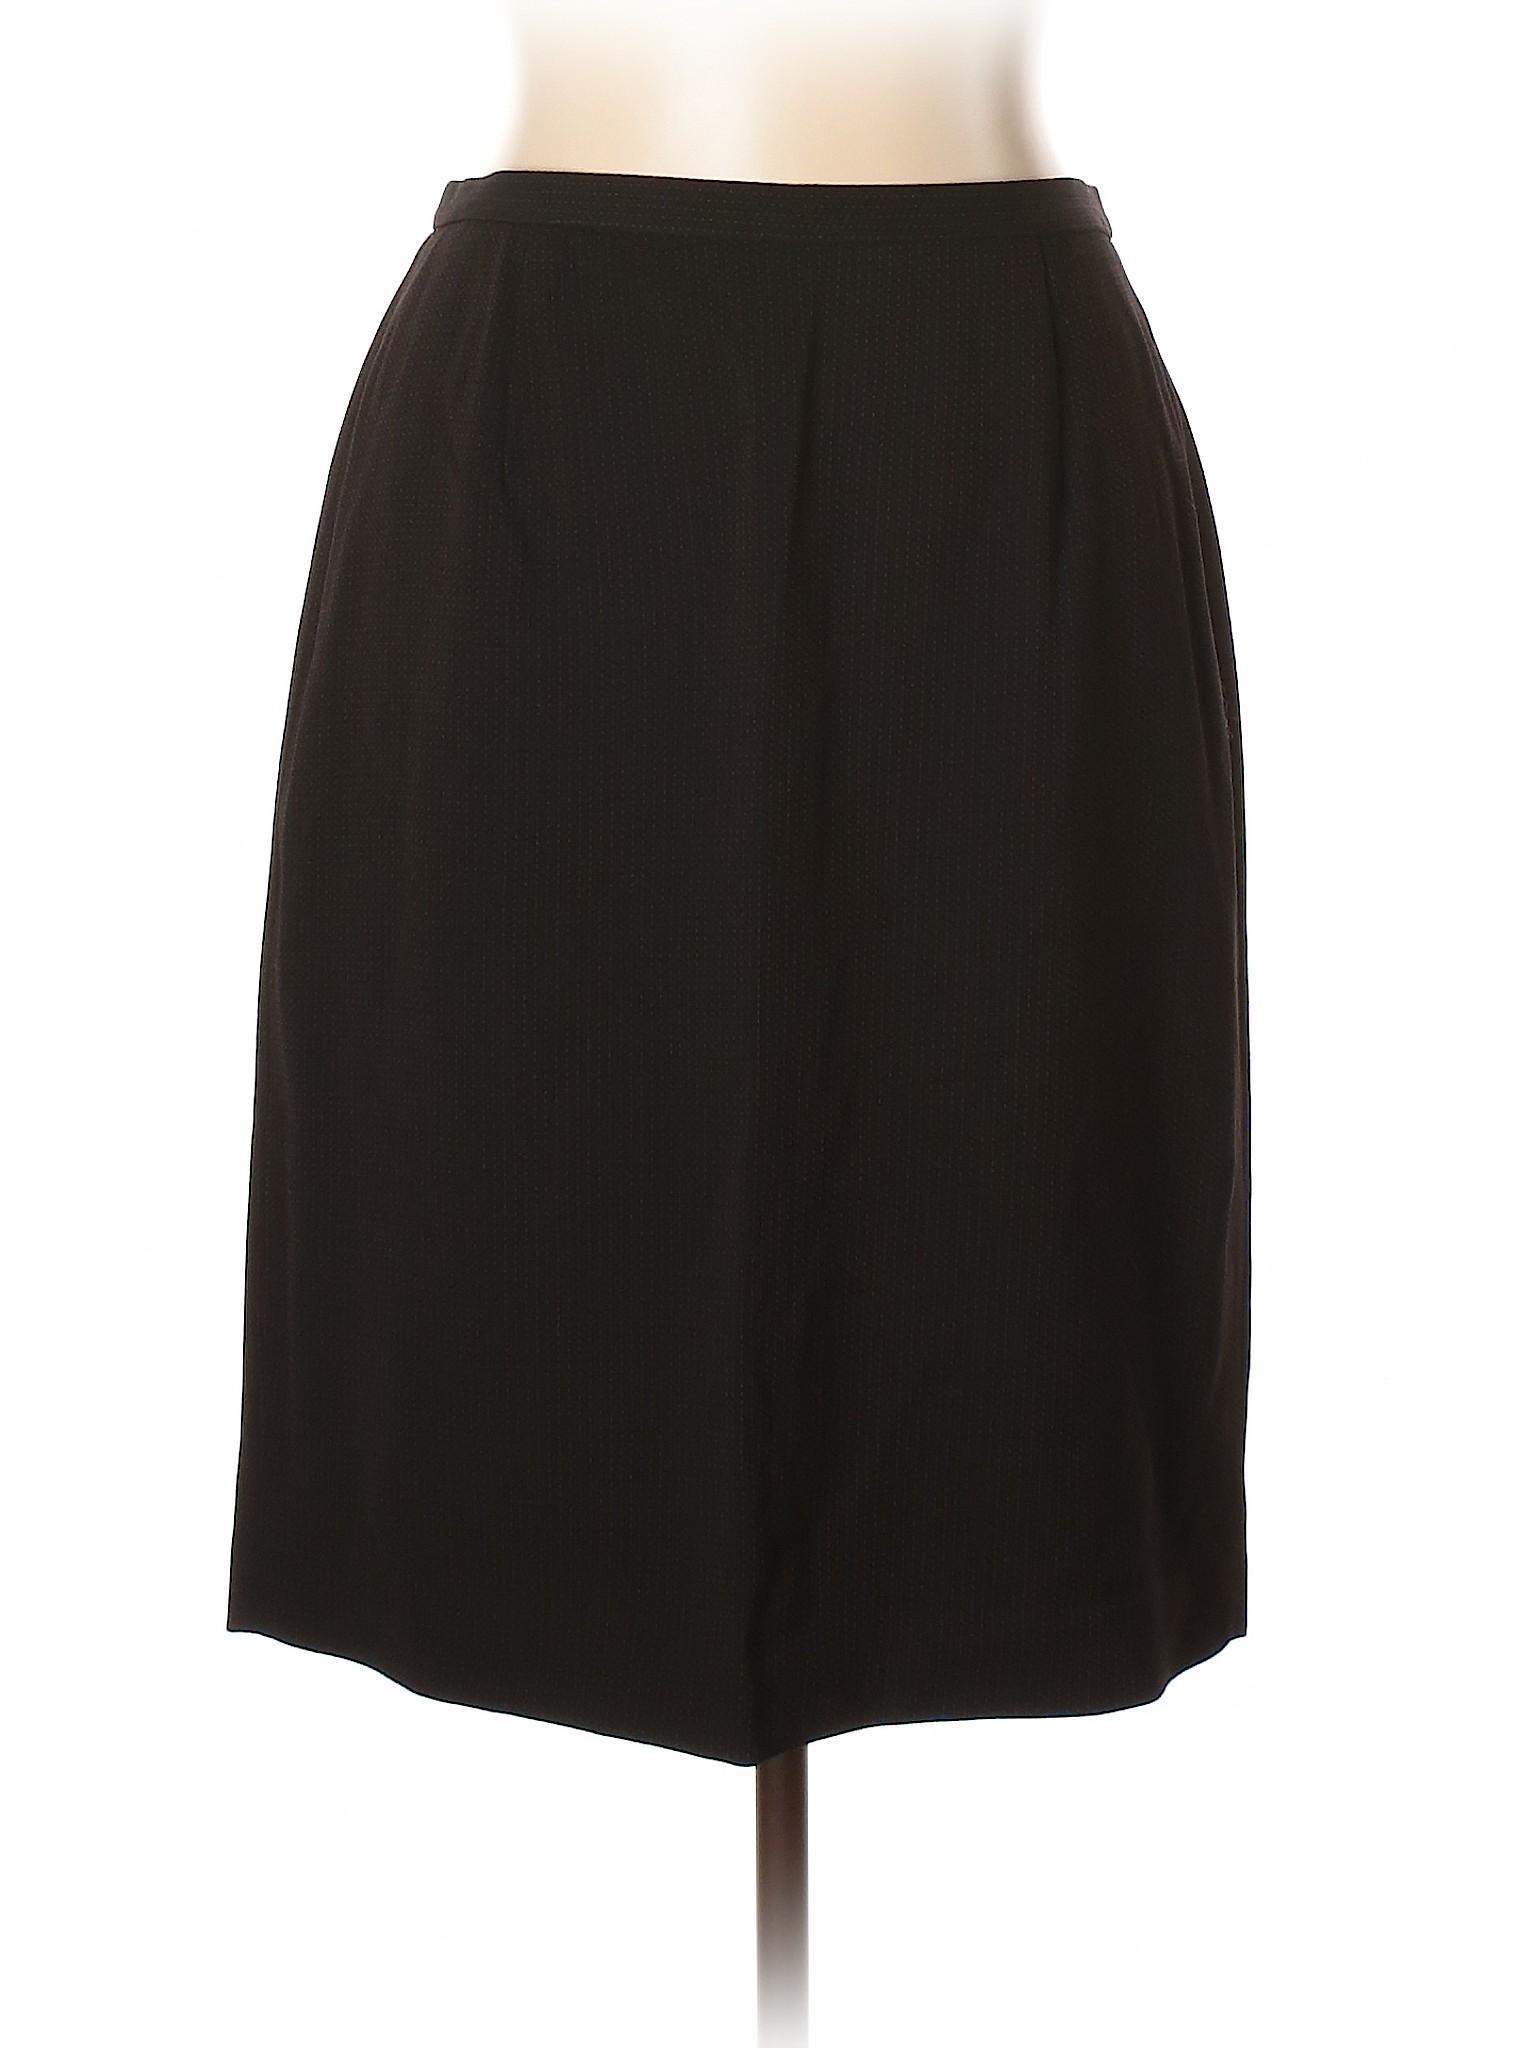 Skirt Wool Boutique Wool Boutique Wool Skirt Boutique pqYwavZ